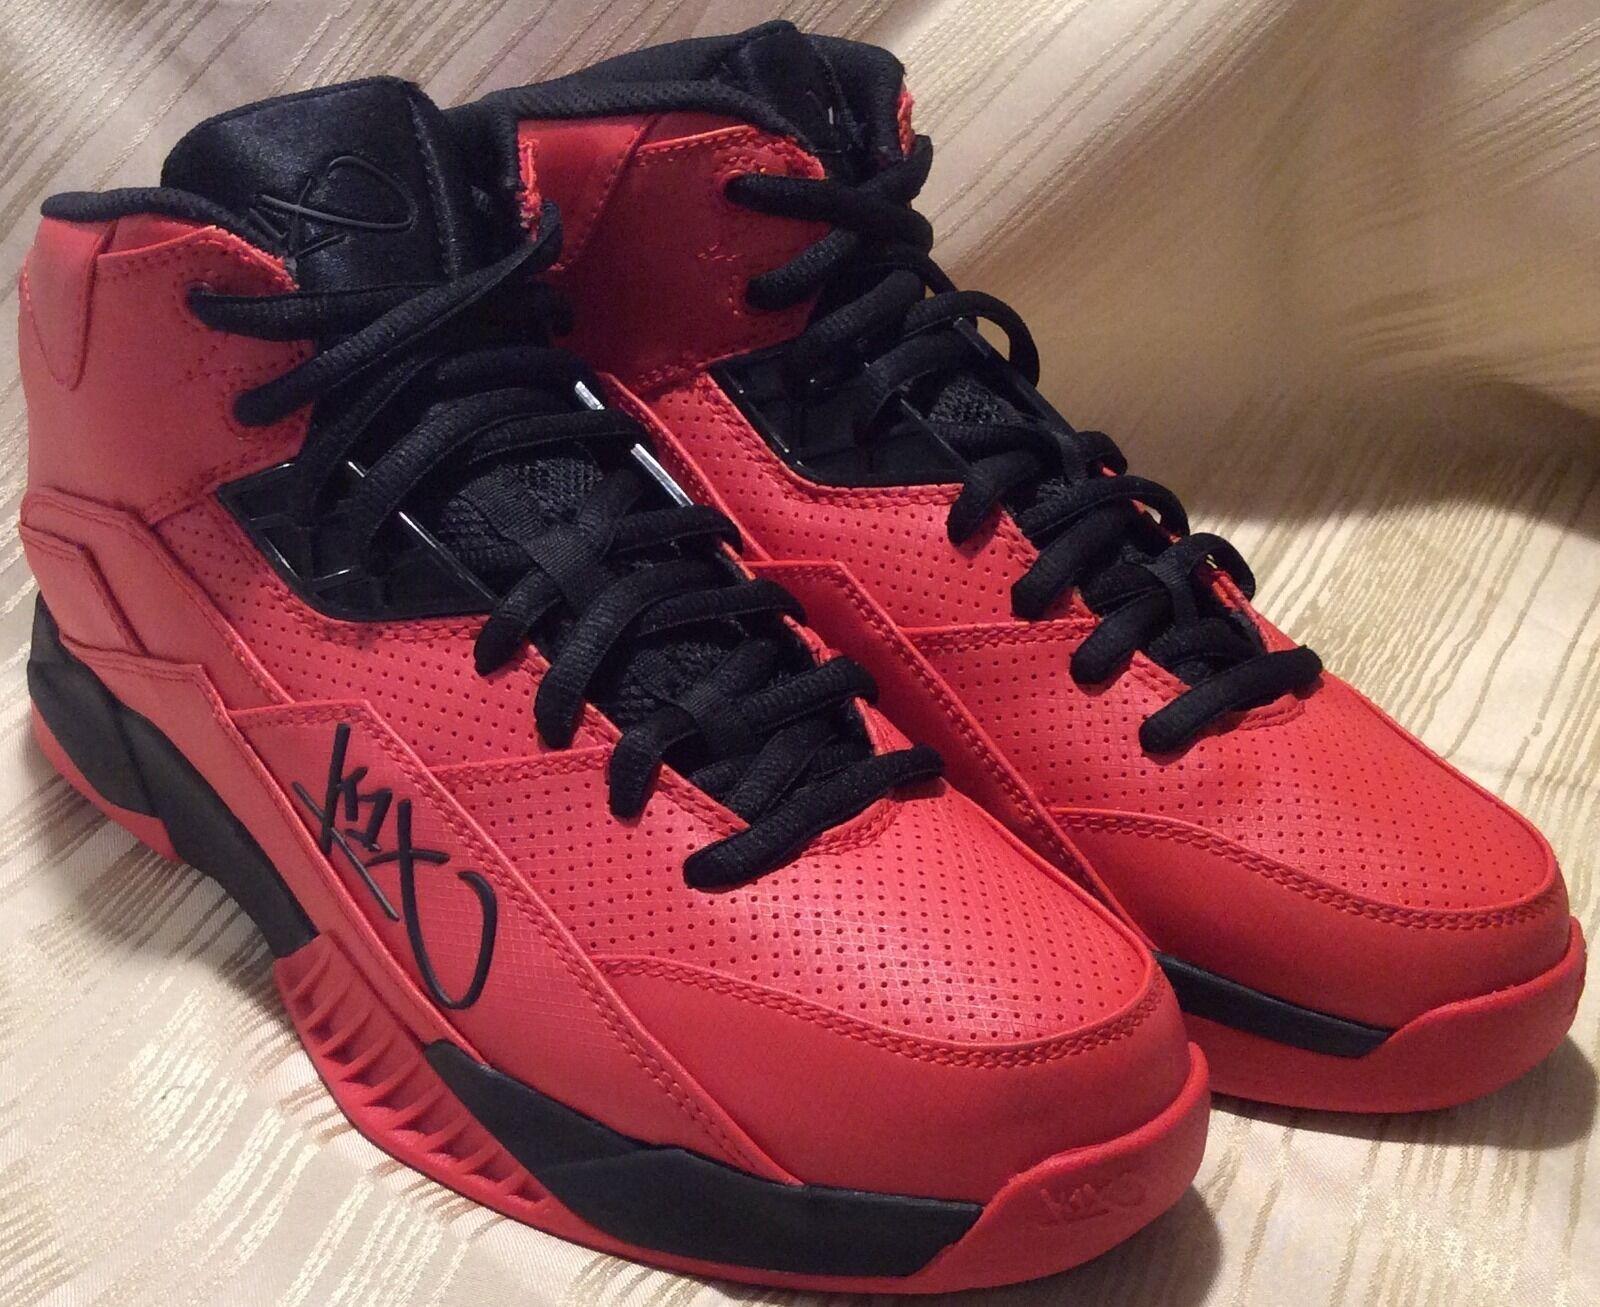 Купить New K1X Anti Gravity Red Black Hi Top на eBay.com из Америки ... 6877451c951a